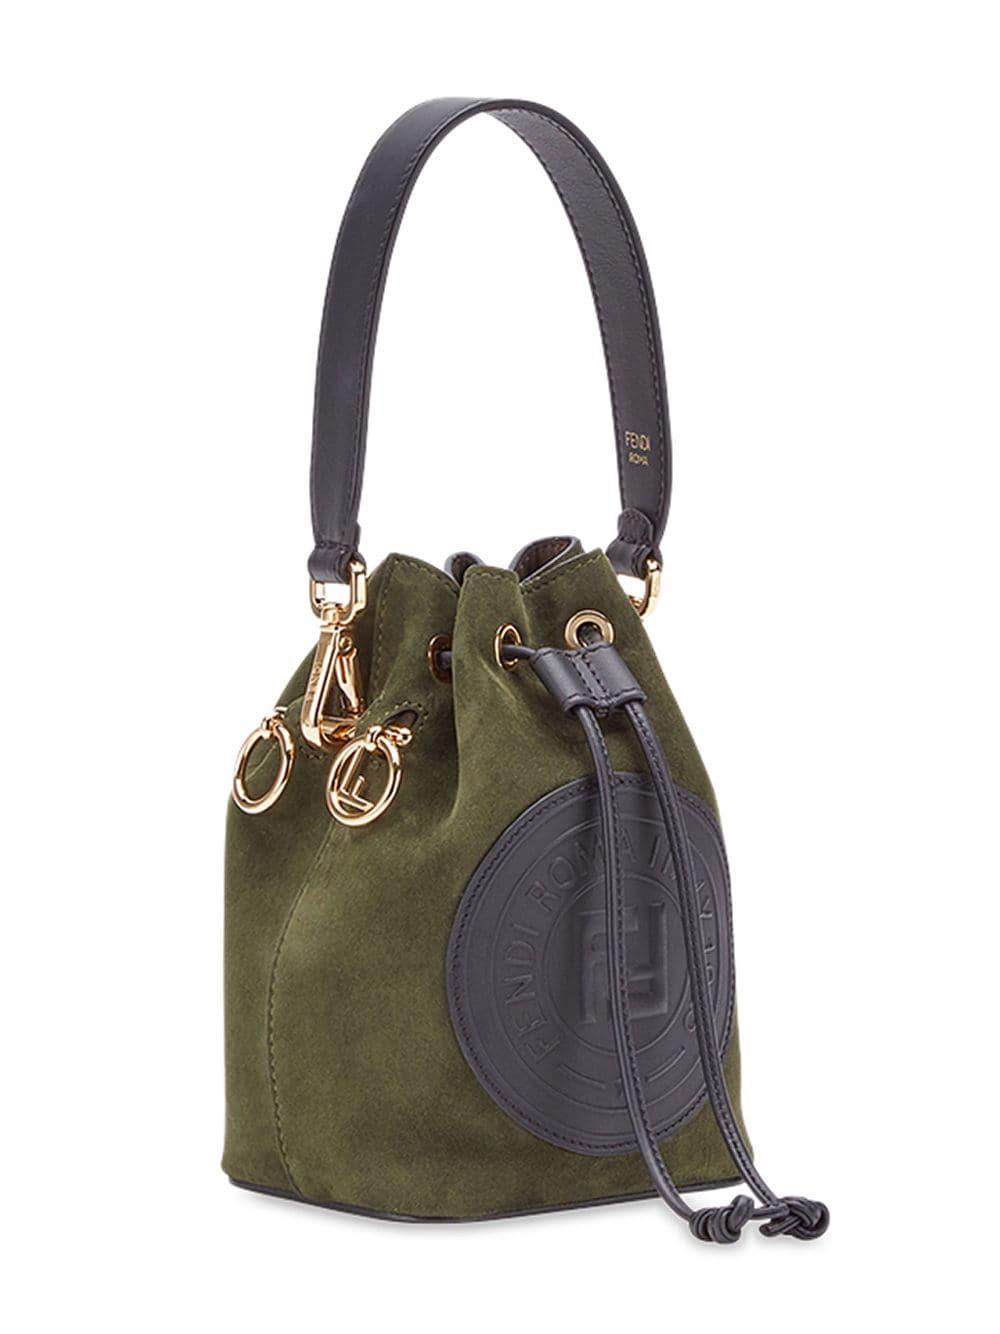 8eba763d5216 Fendi Green Mon Tresor Mini Bag in Green - Lyst